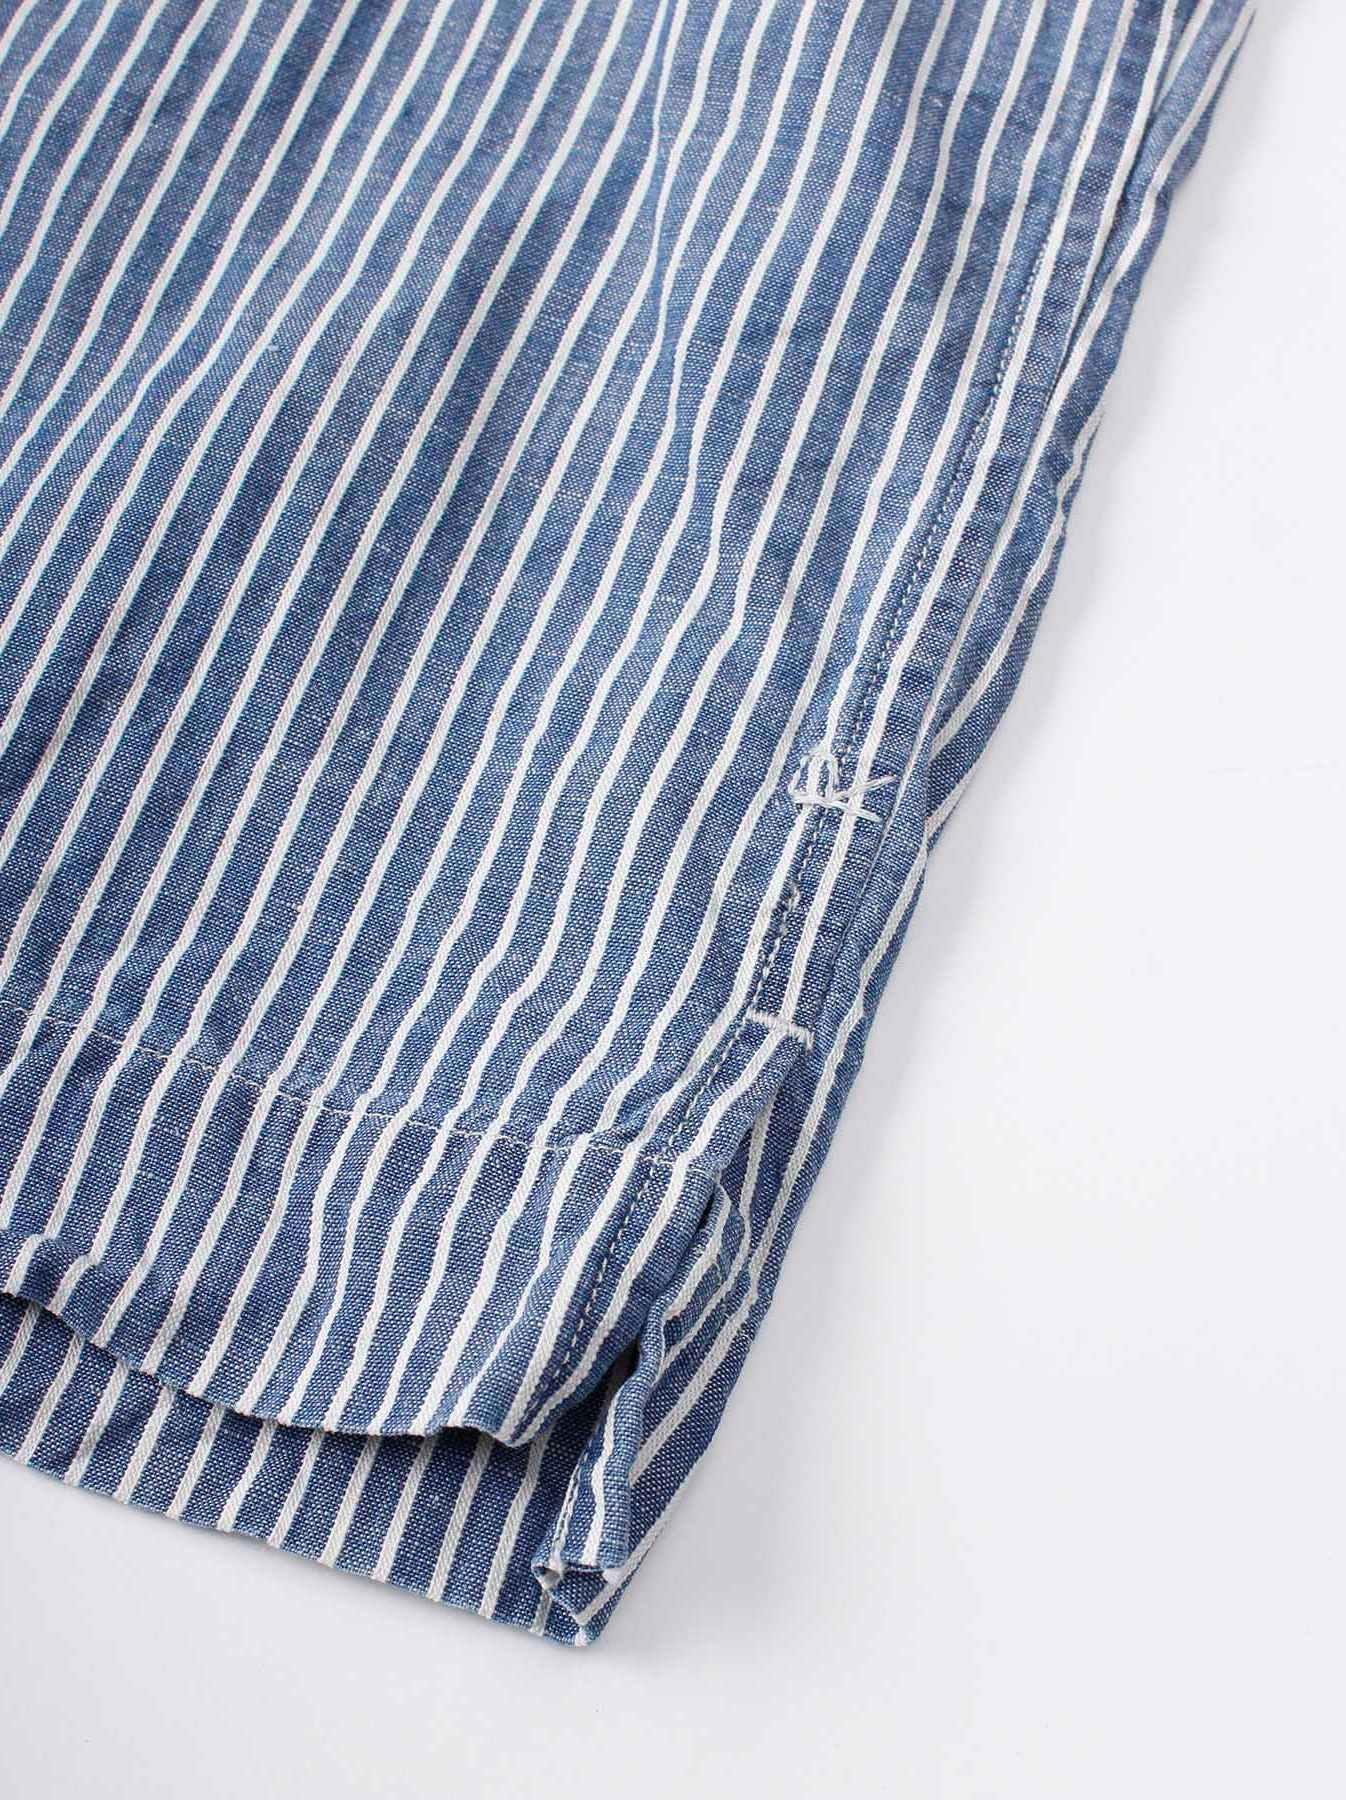 WH Cotton Linen Hickory Umahiko Pullover Shirt-10